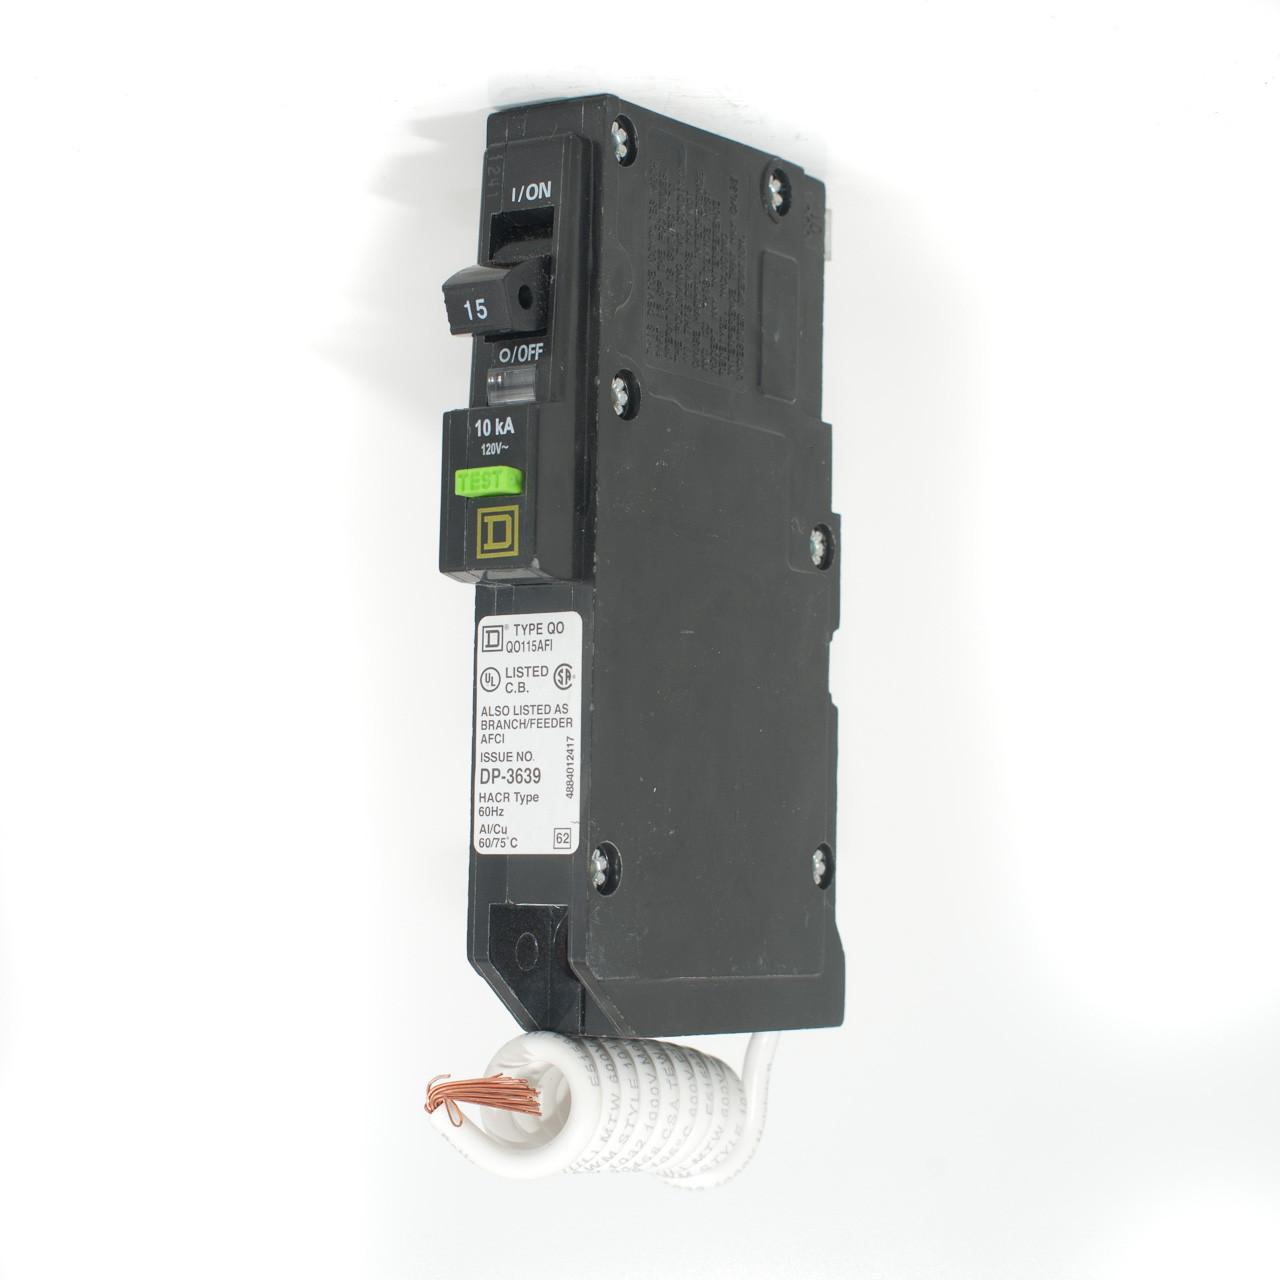 Square D 15a Single Pole Afci Push-on Breaker